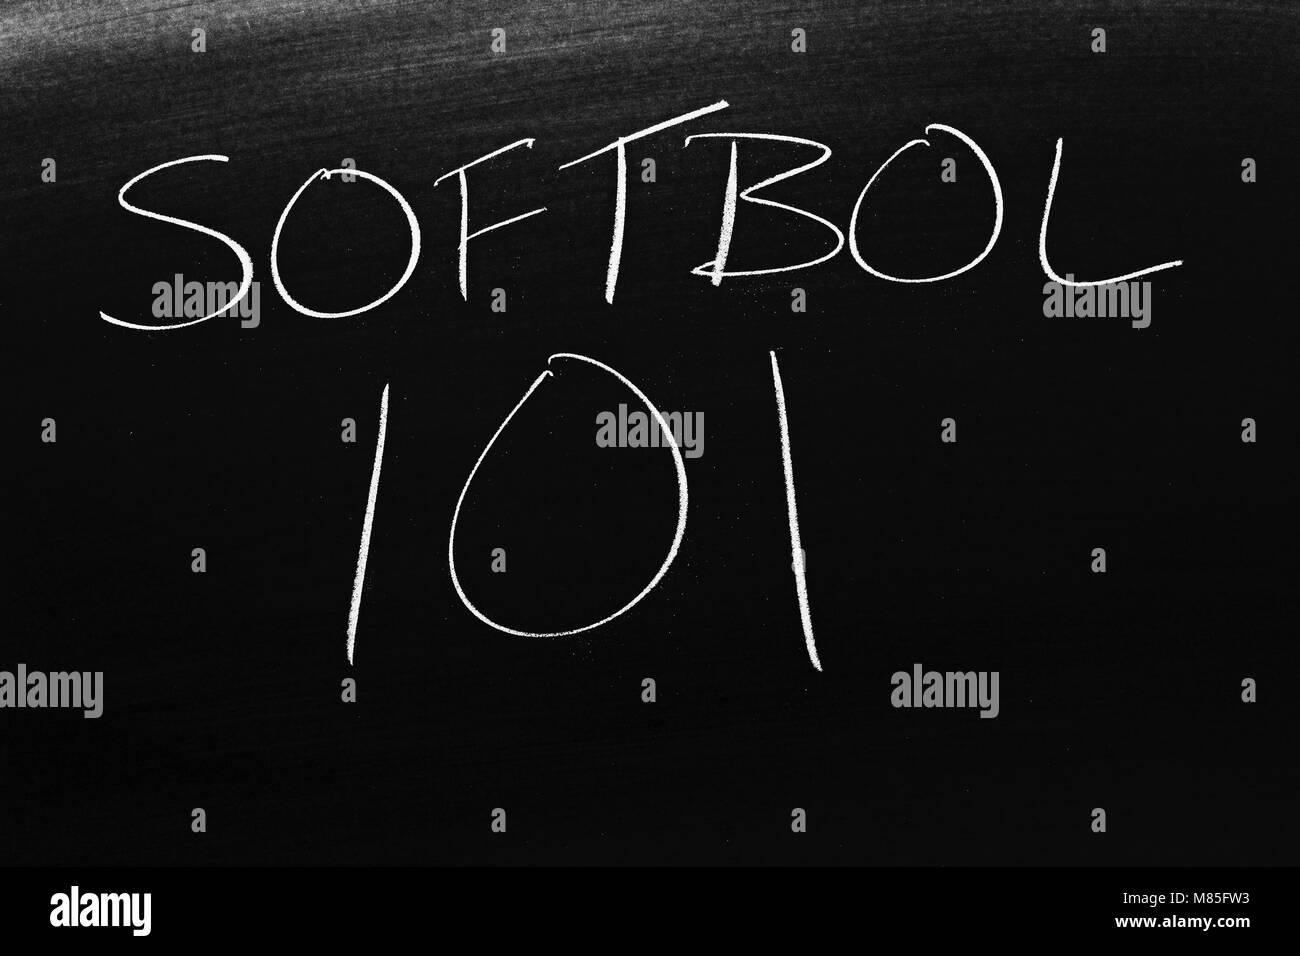 The words Softbol 101 on a blackboard in chalk - Stock Image